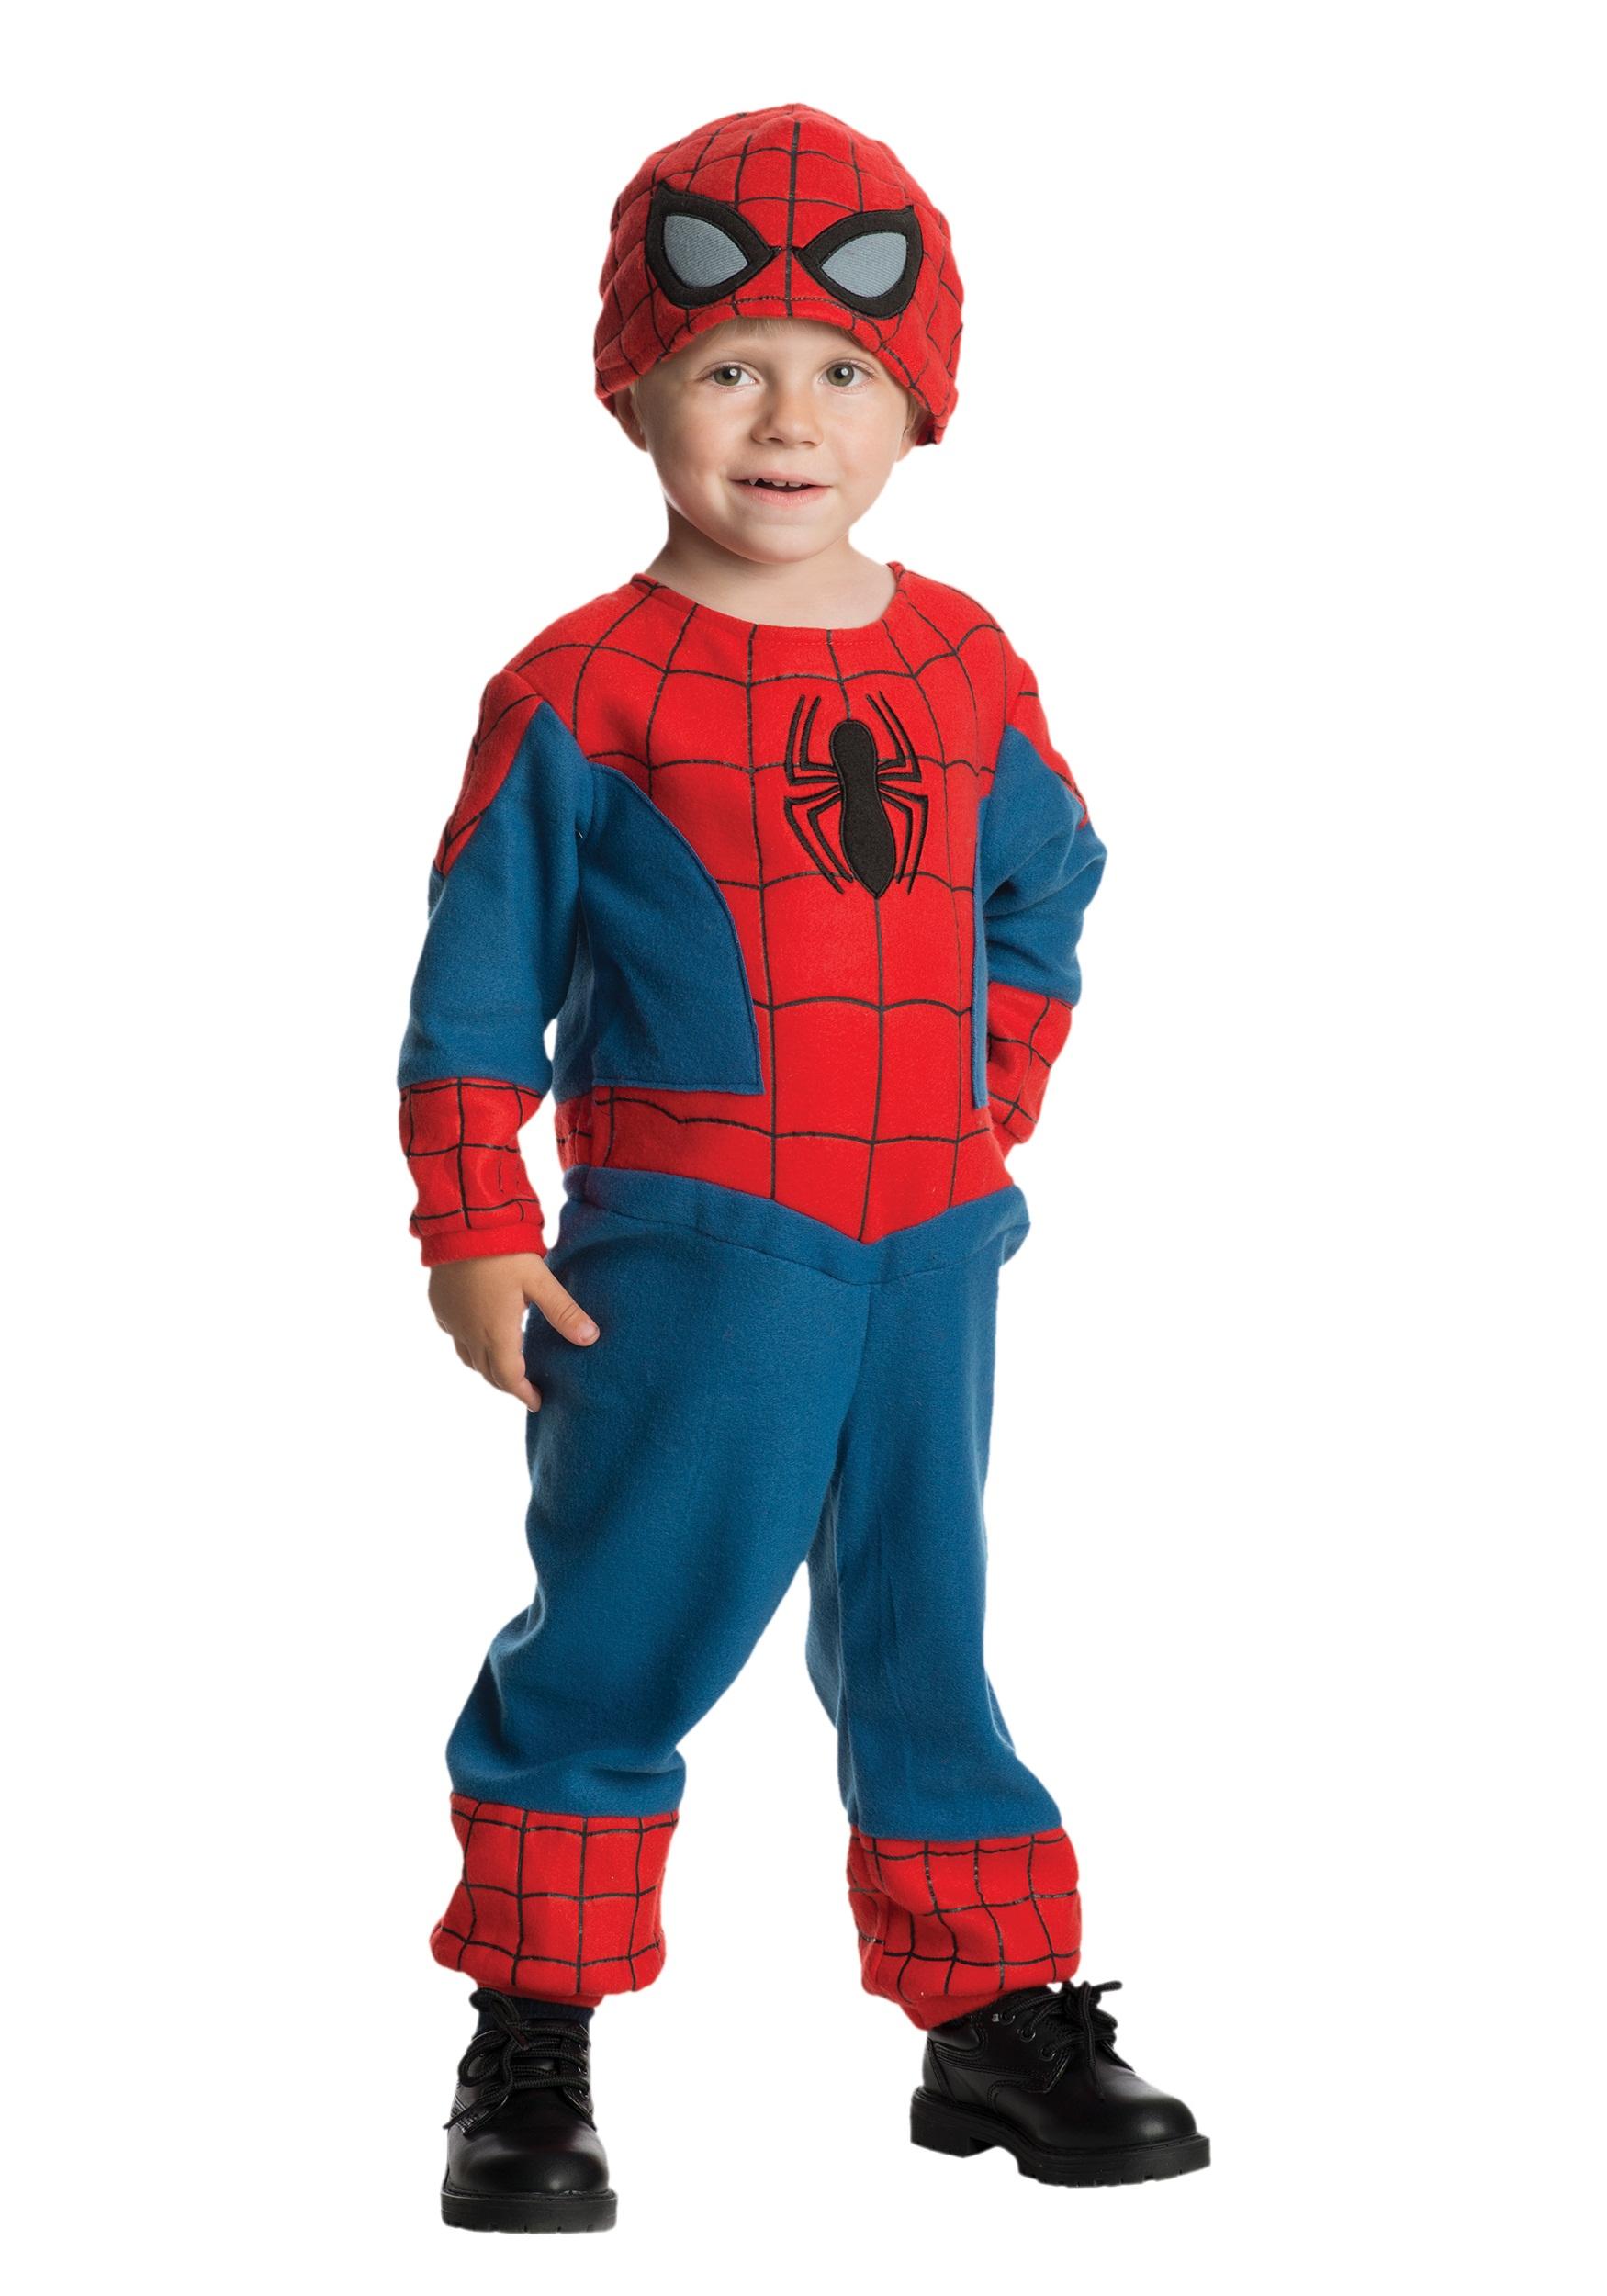 Toddler Amazing Spider-Man Fleece Jumpsuit  sc 1 st  Halloween Costumes & Toddler Amazing Spider-Man Fleece Jumpsuit - Halloween Costumes